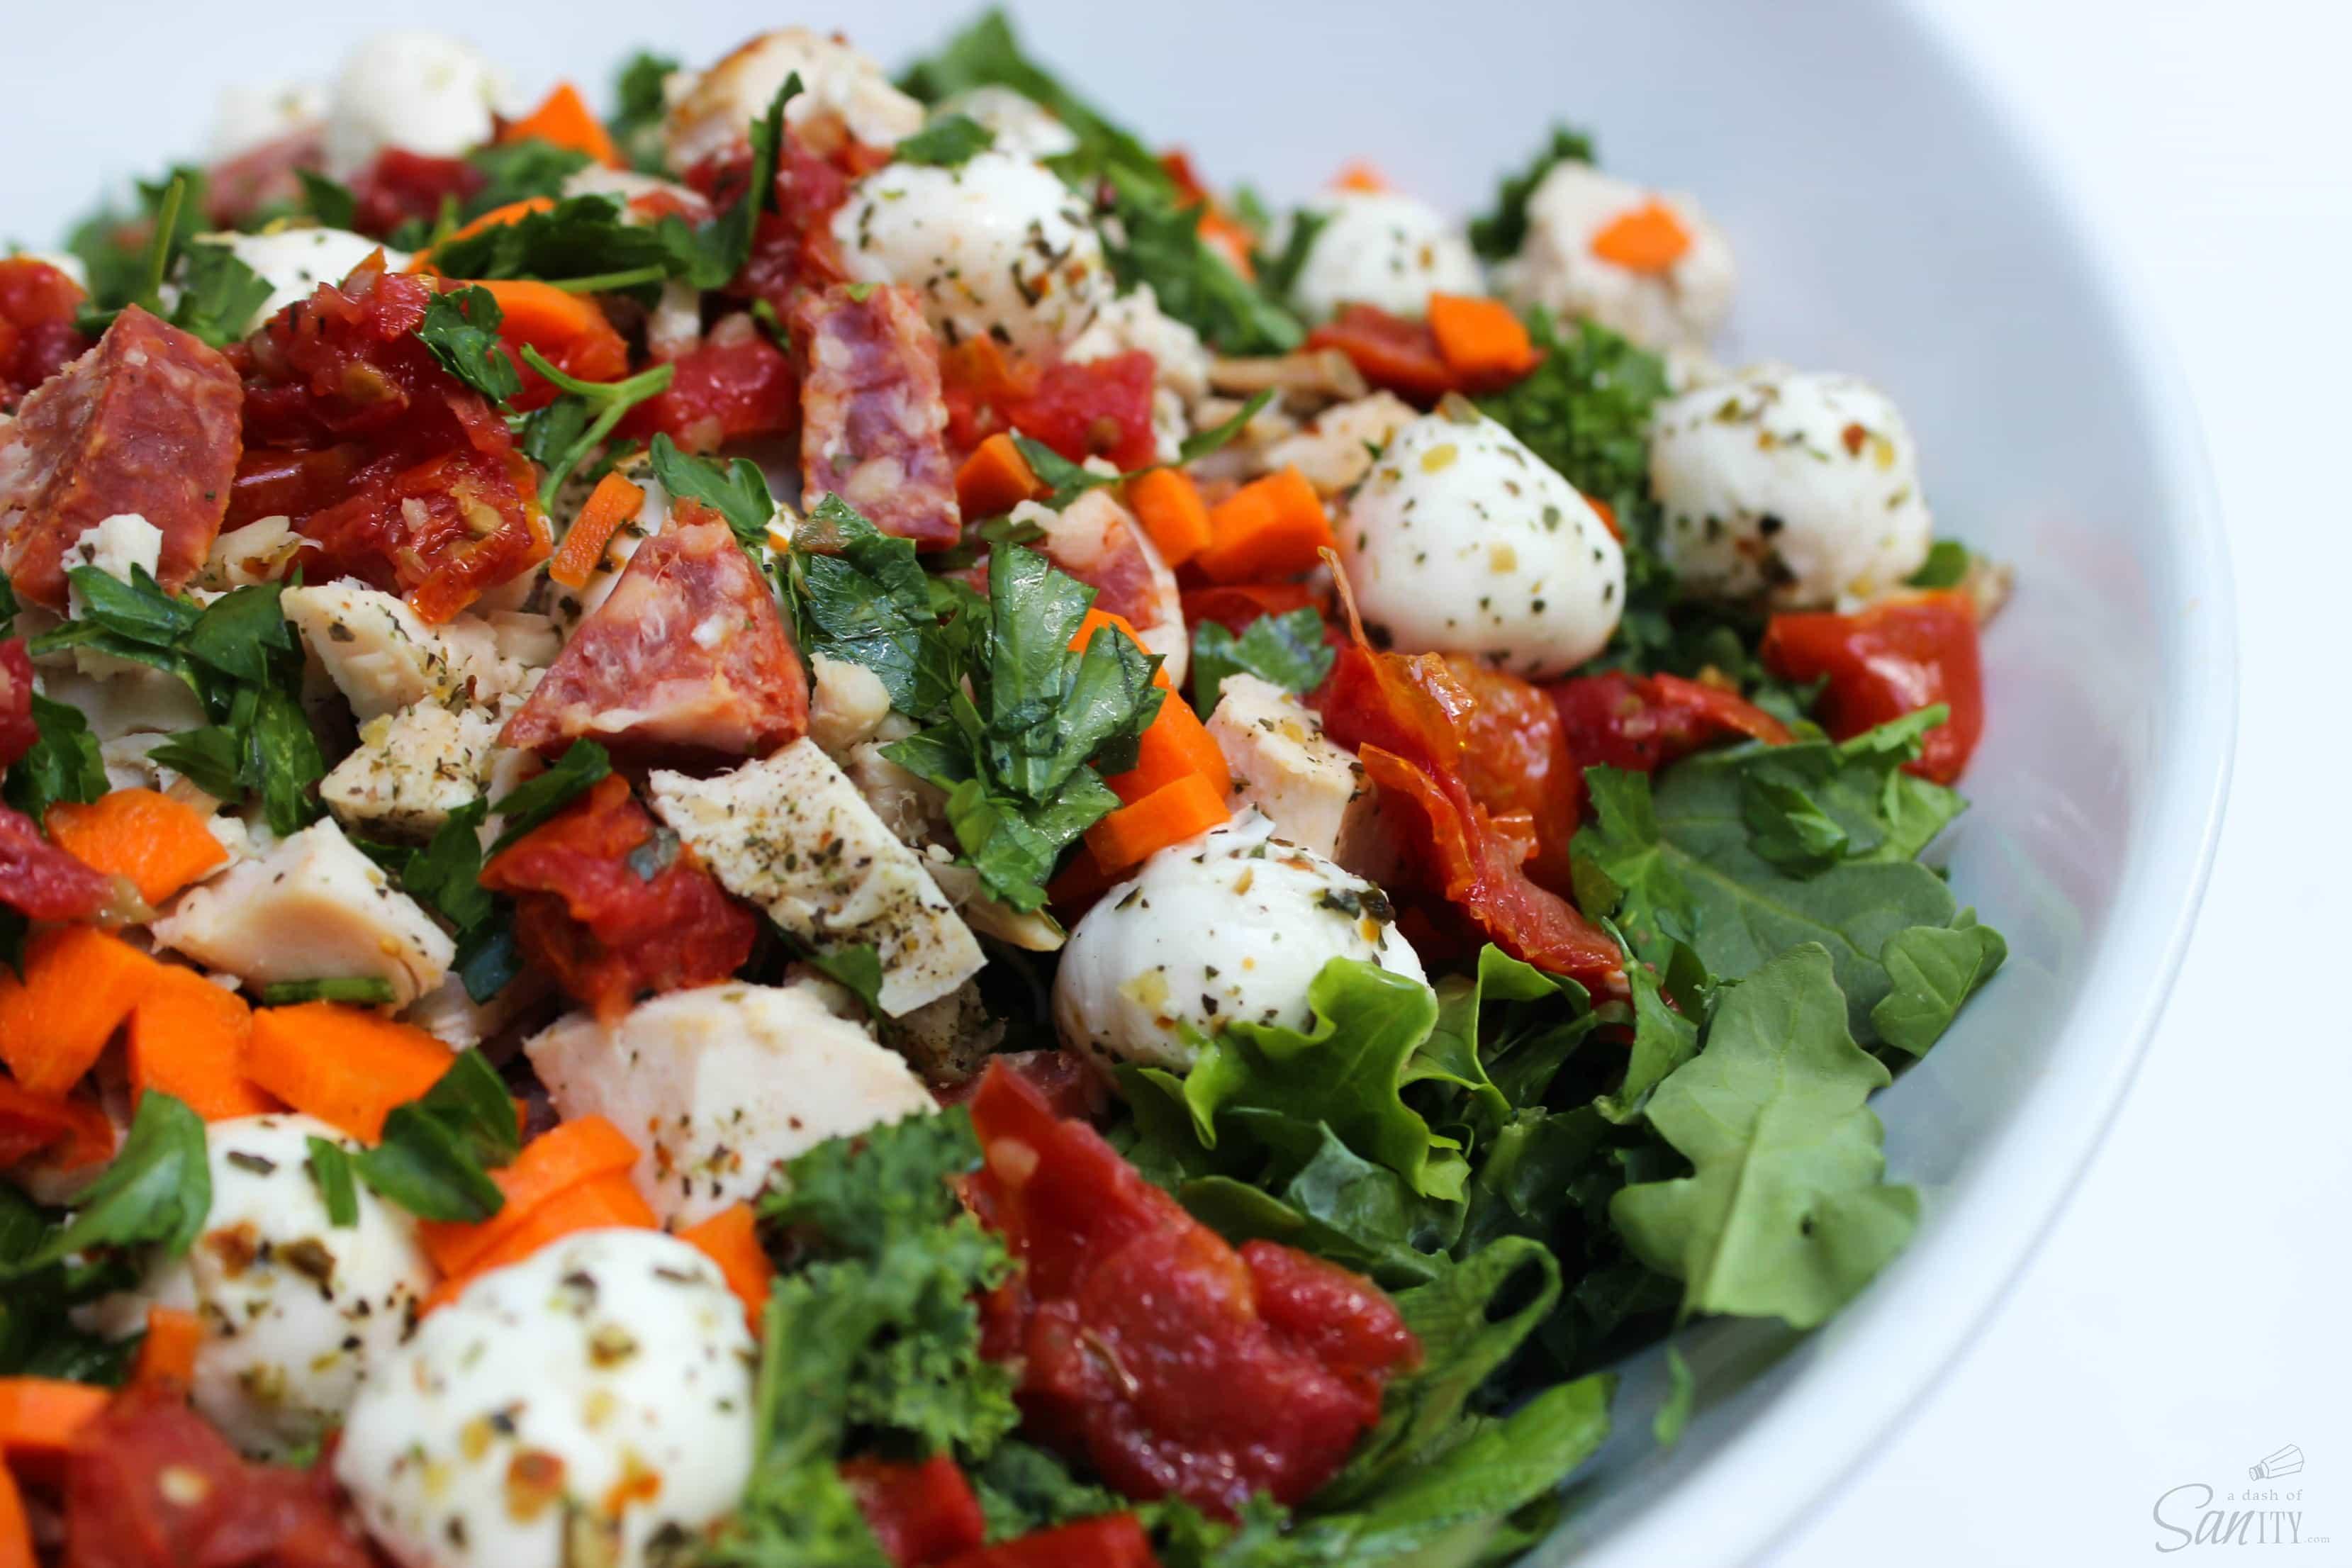 ... .com/2015/06/italian-kale-salad-with-sweet-lemon-garlic-vinaigrette